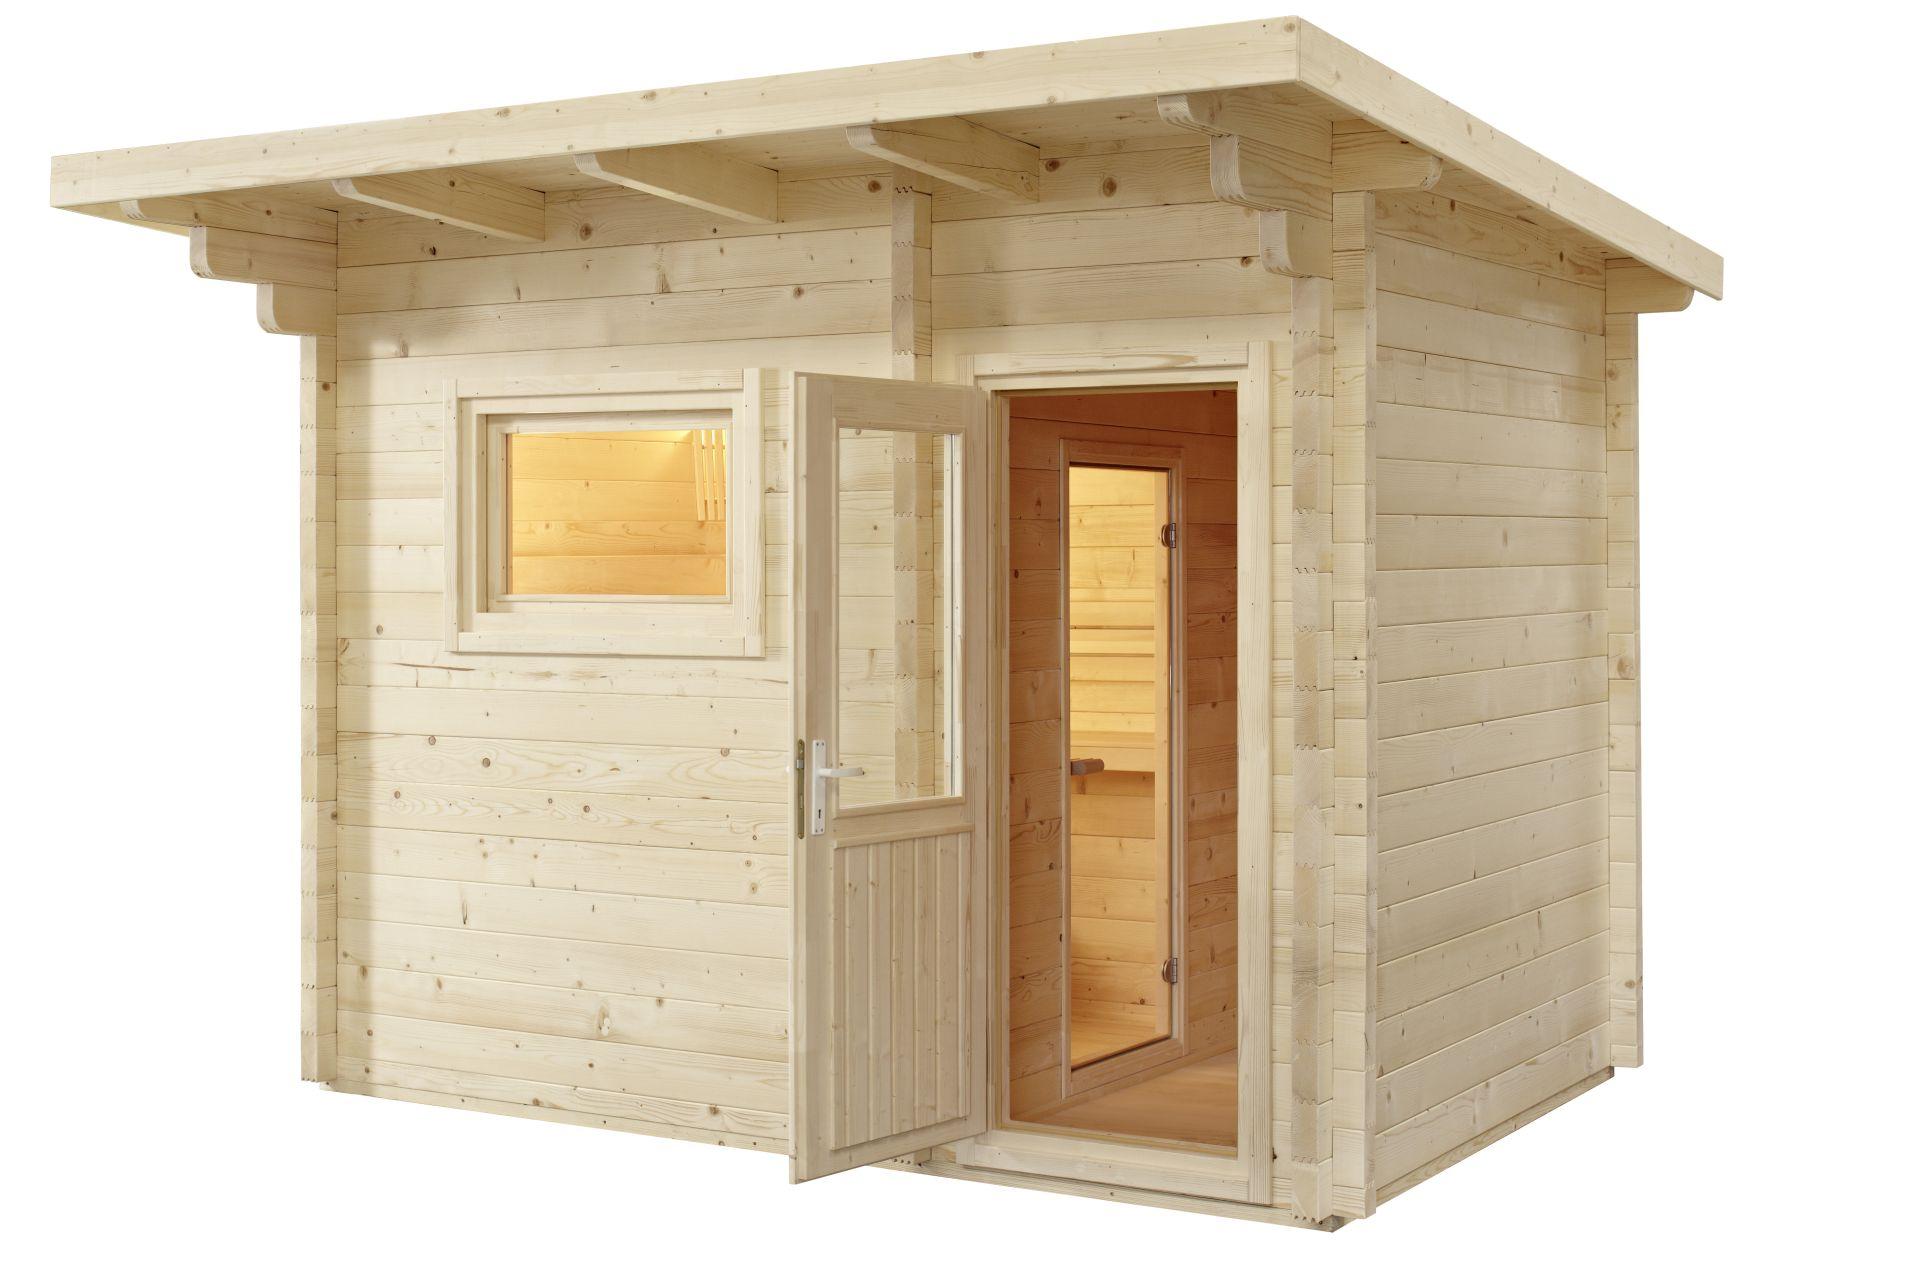 saunahaus lava 230x375x270 cm 3 personen sentiotec. Black Bedroom Furniture Sets. Home Design Ideas